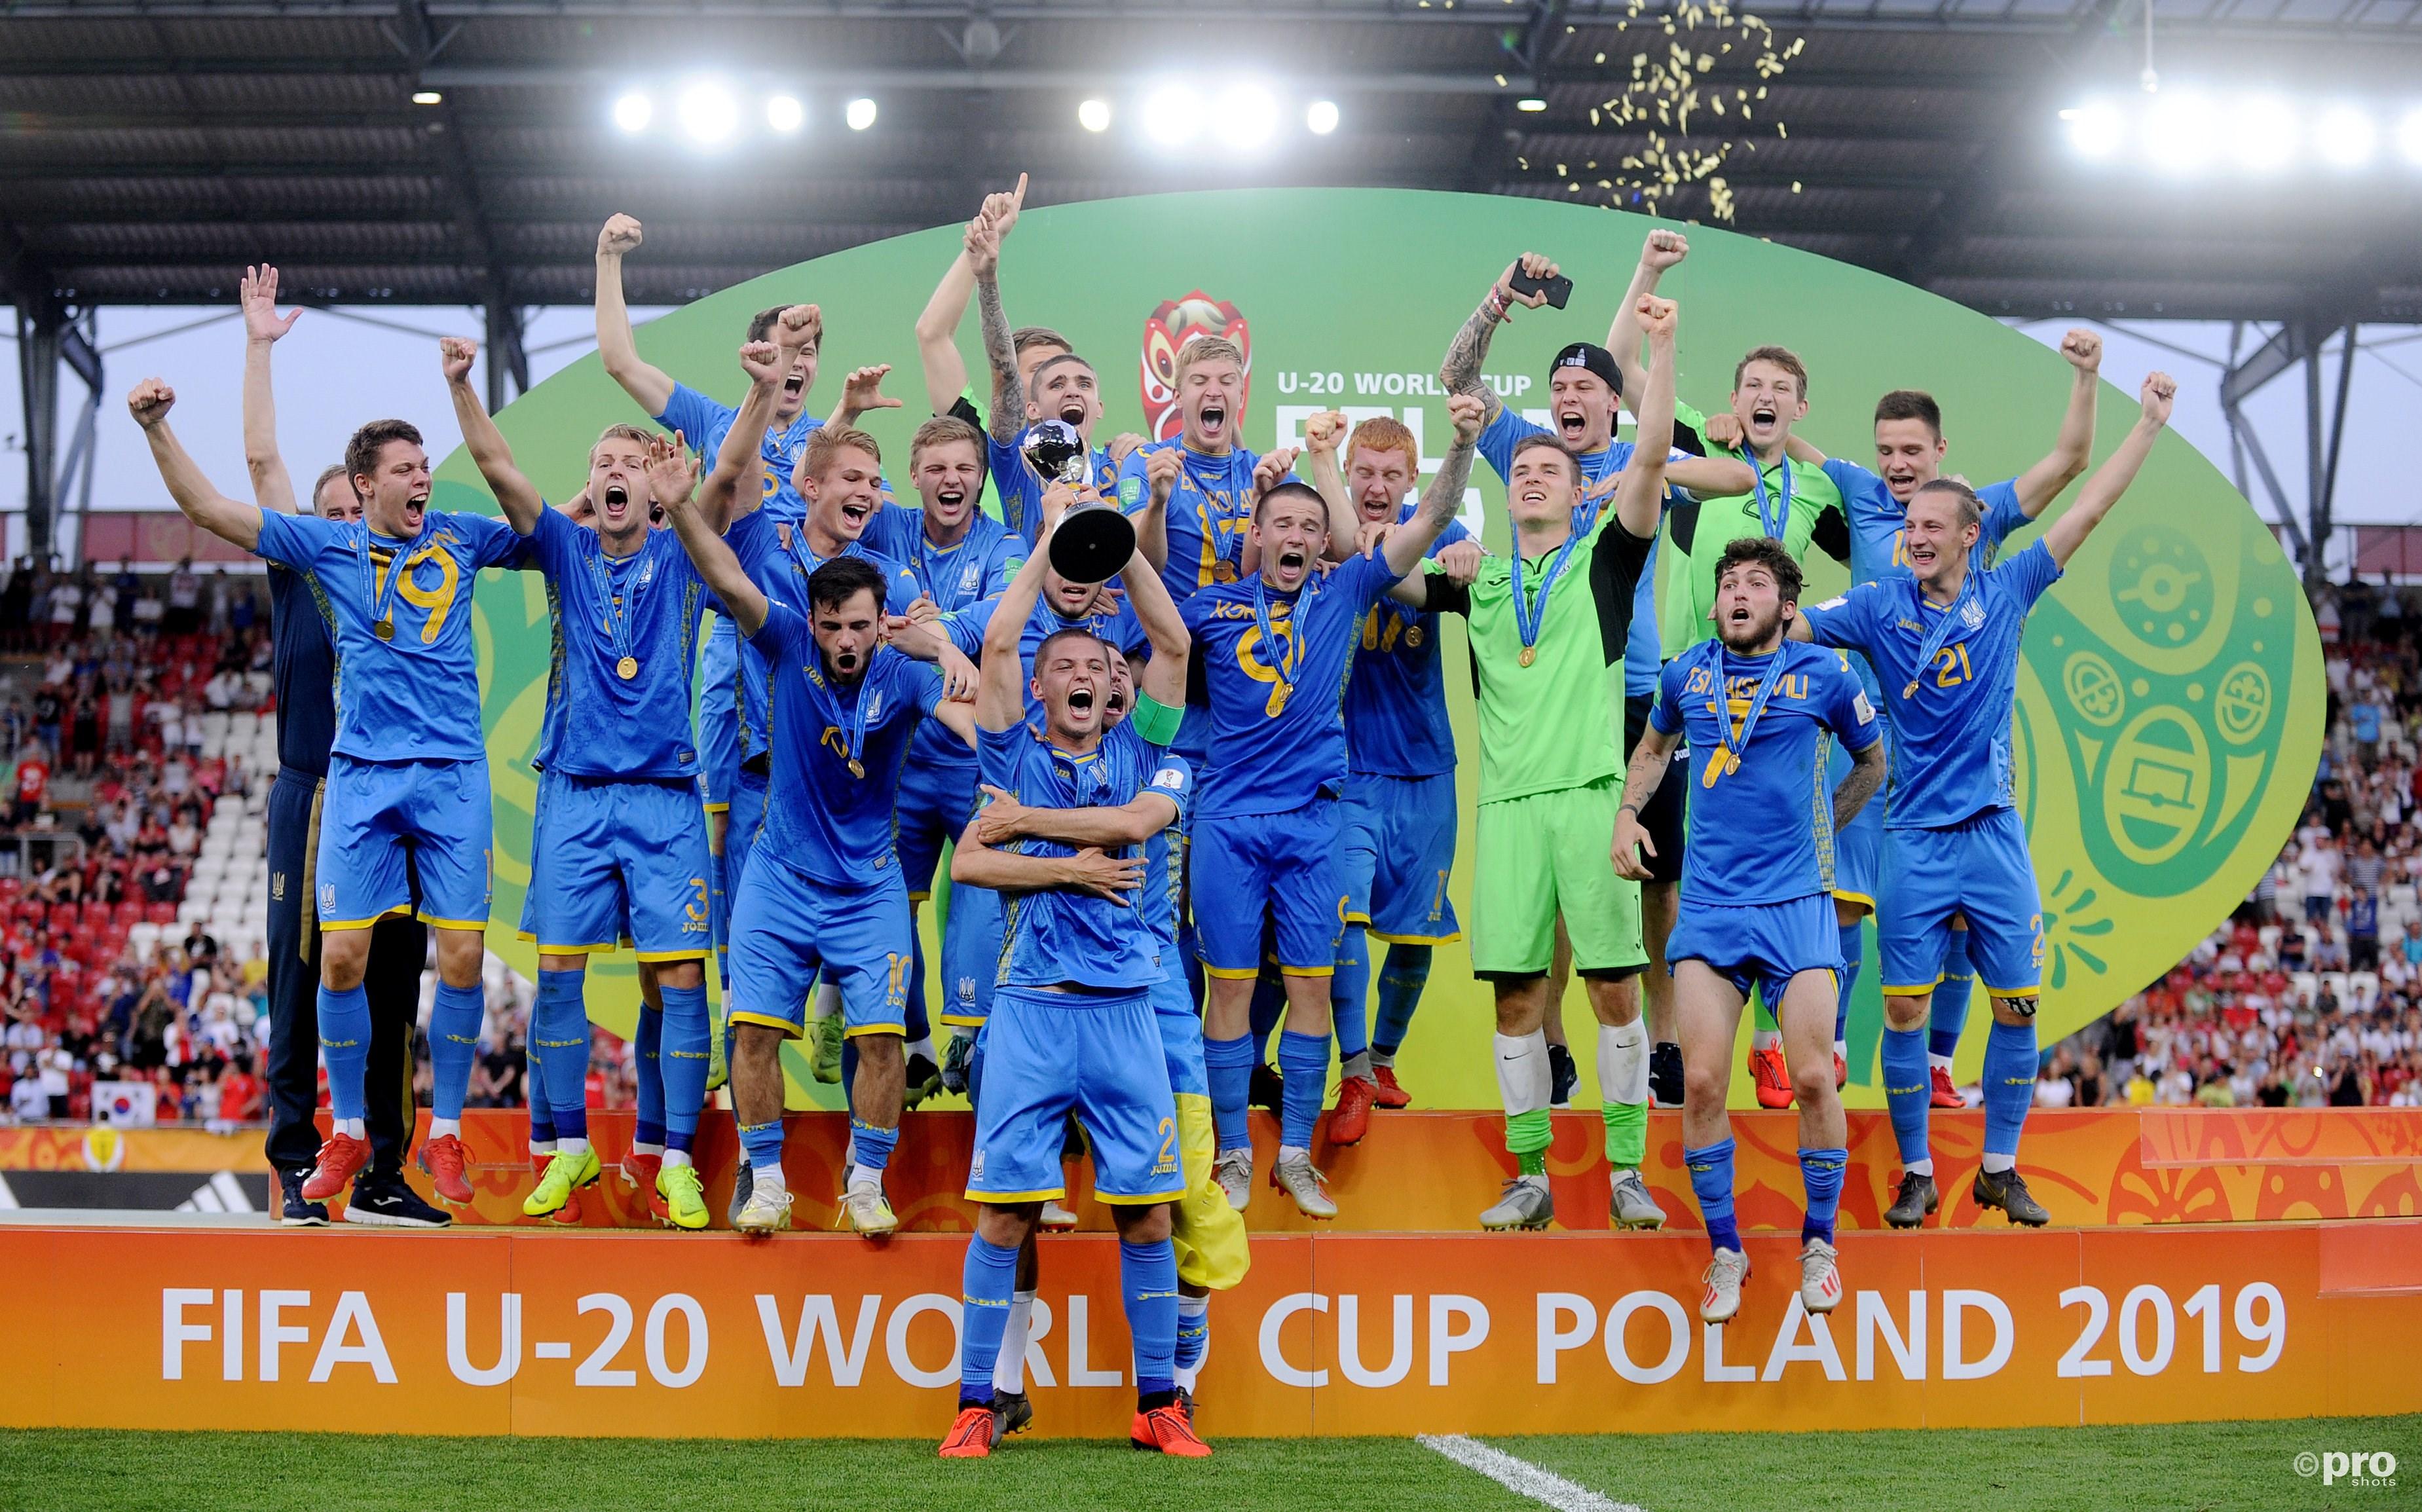 Oekraïne wint WK Onder 20. (PRO SHOTS/SIPA USA)